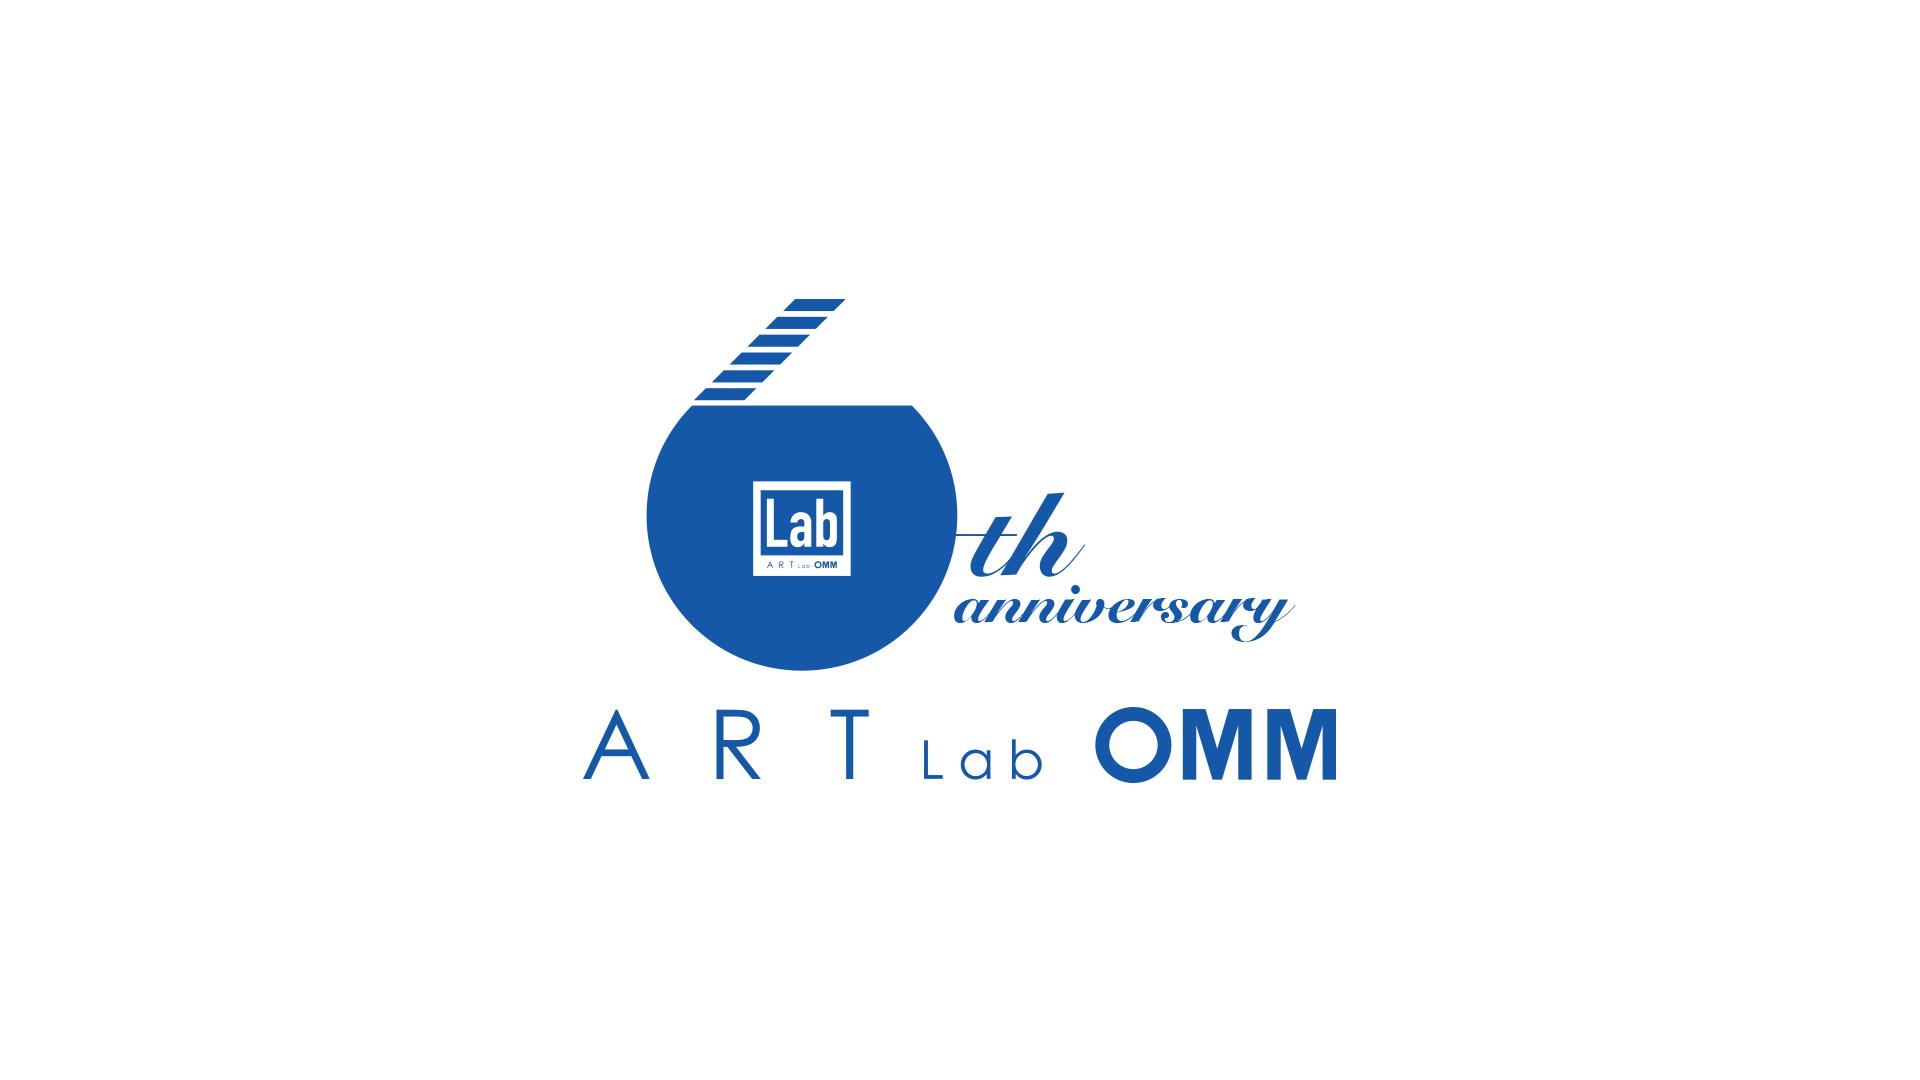 ART Lab OMM